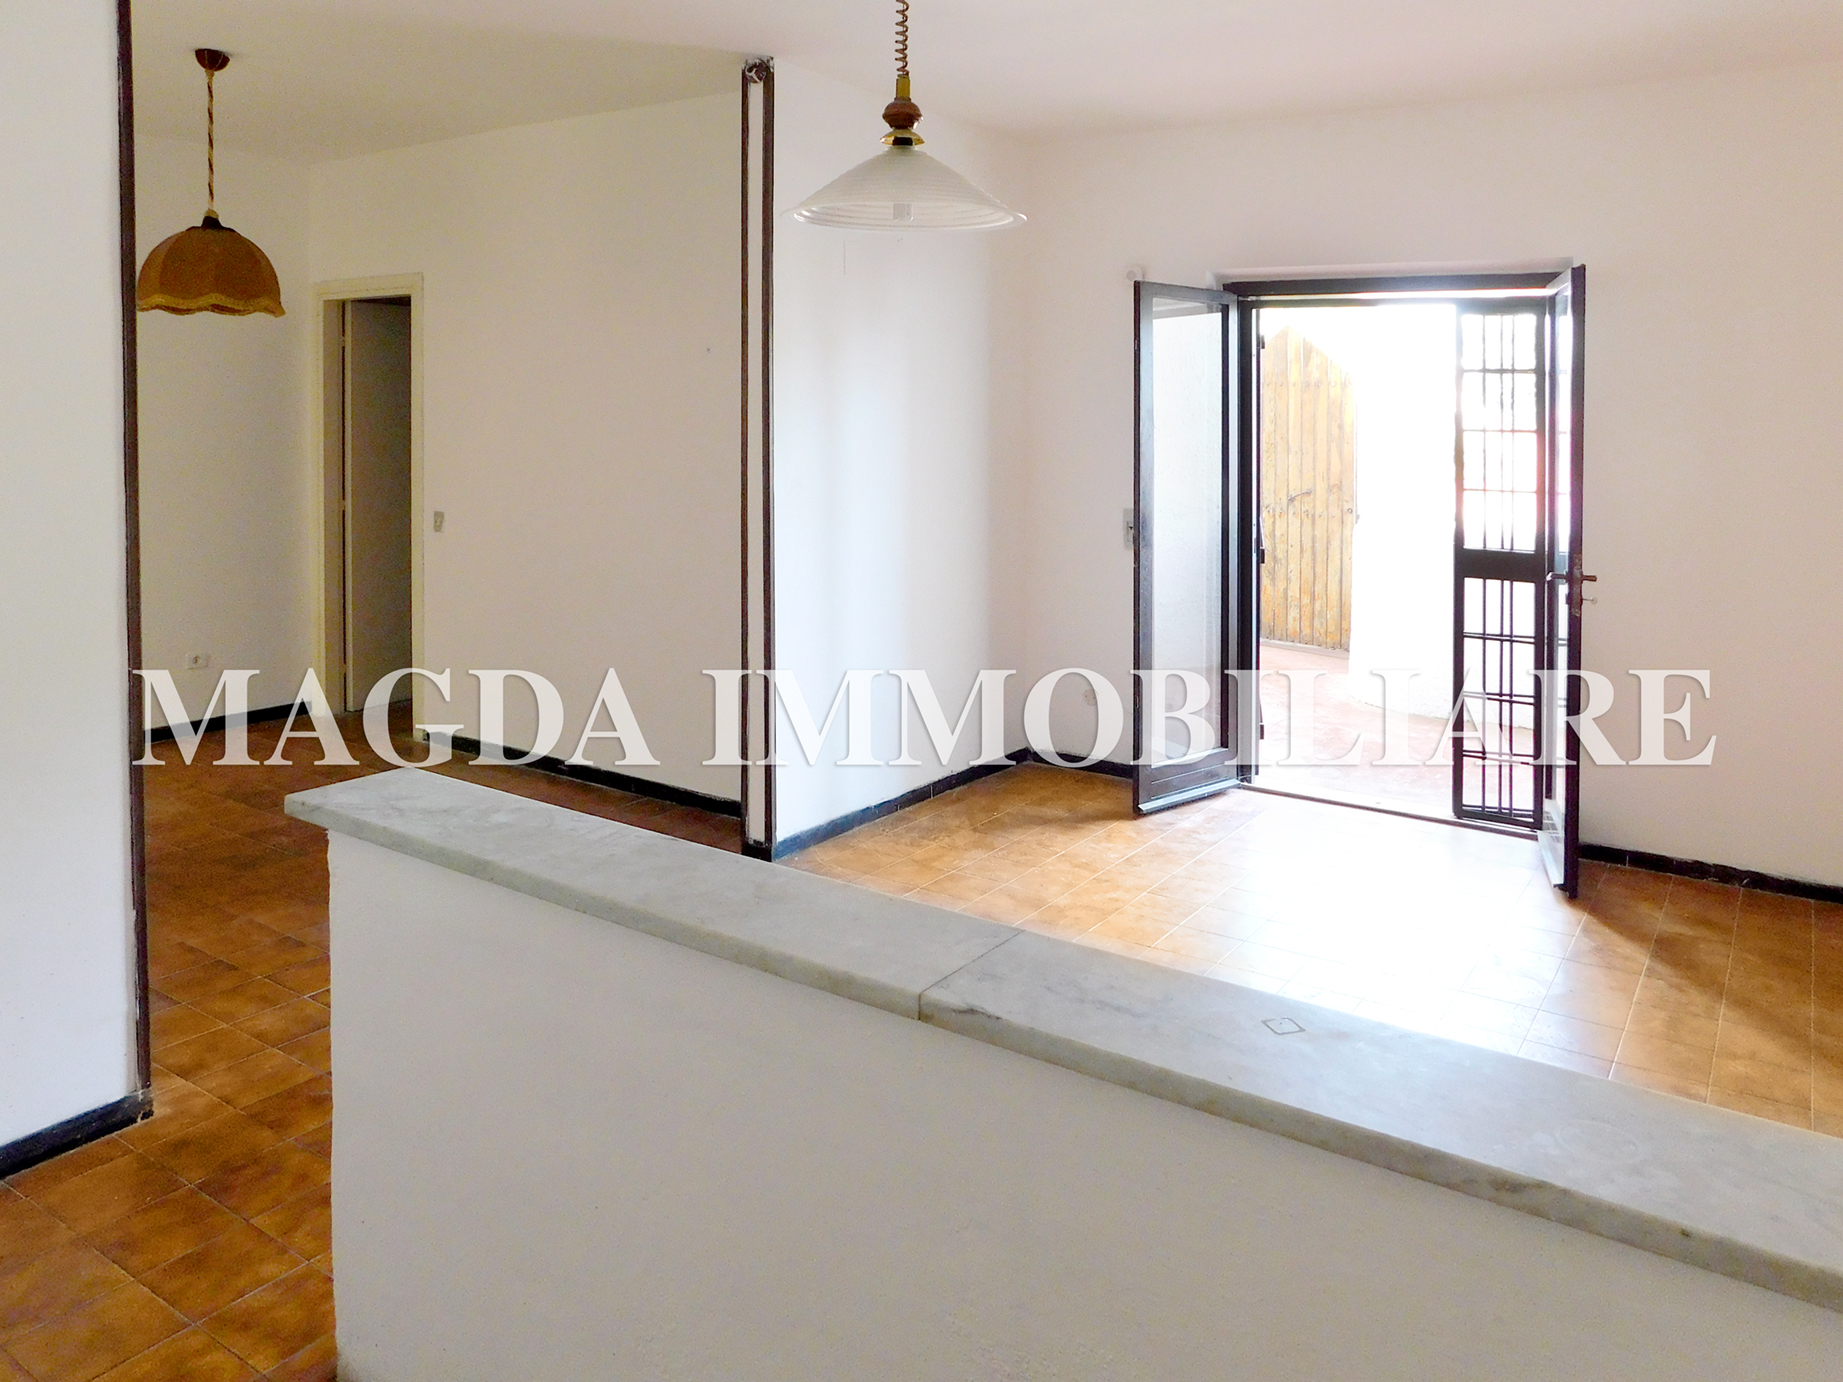 Appartamento a Cerenova - Largo Roma, 8